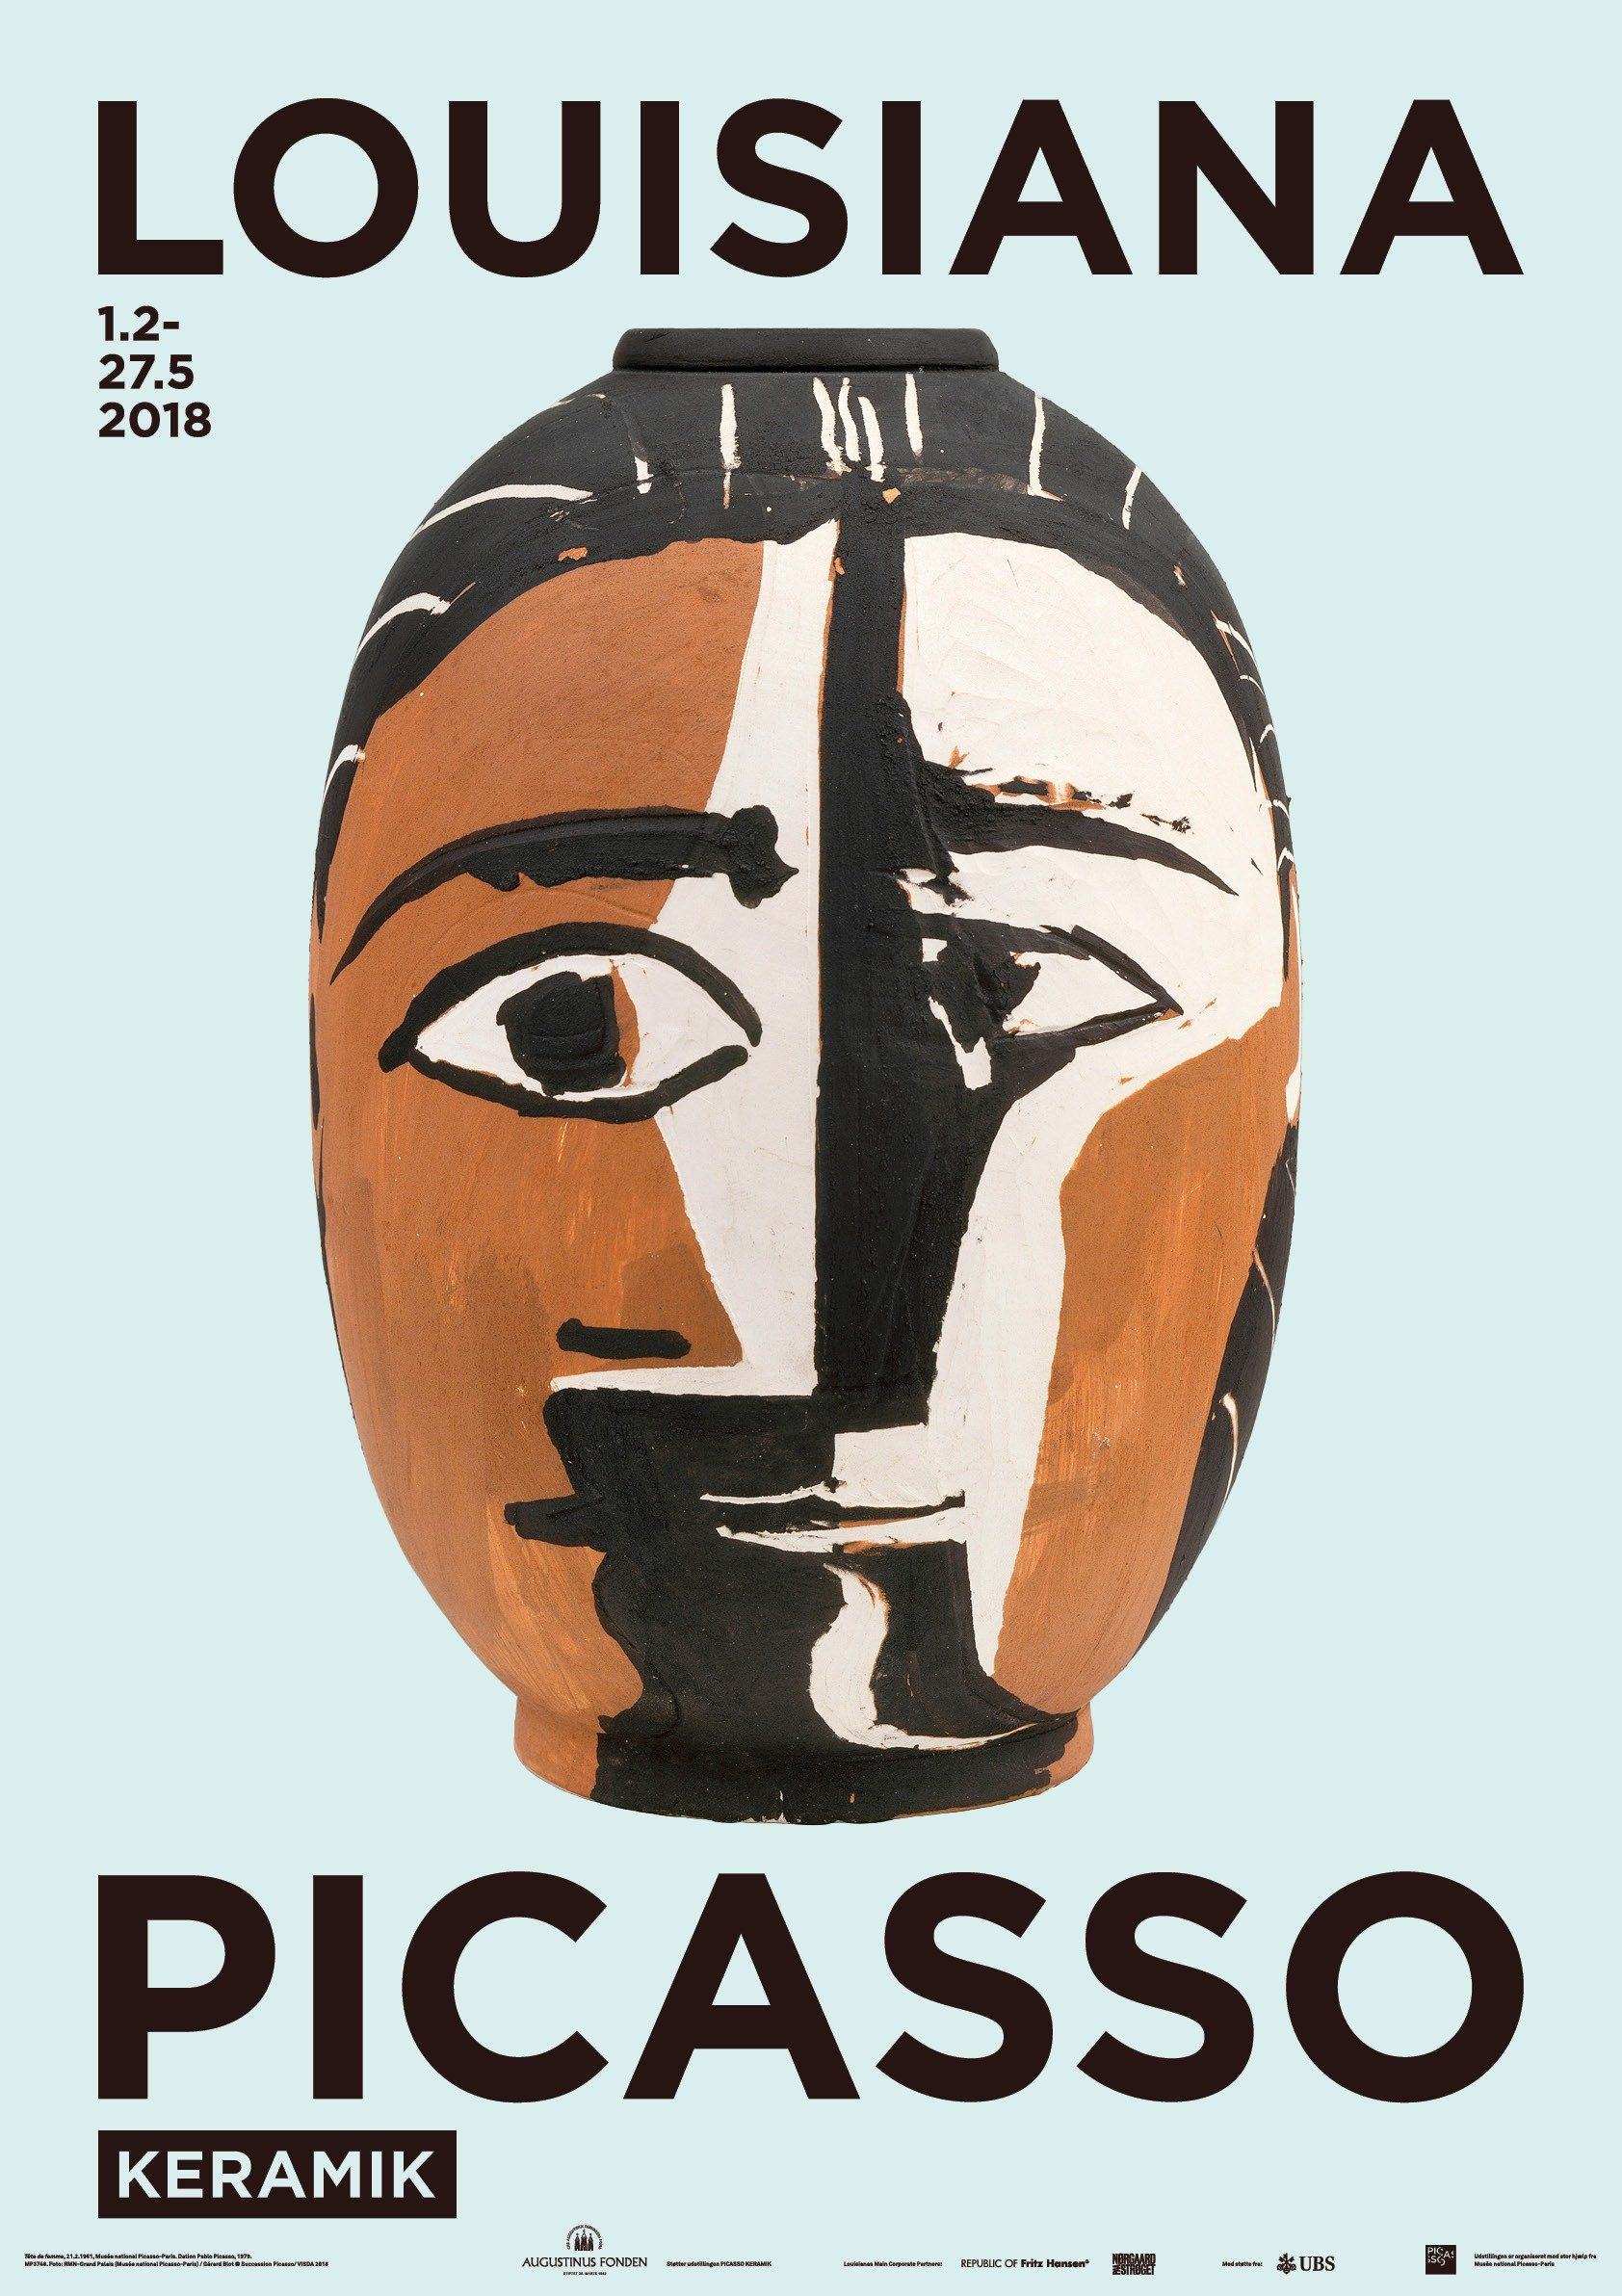 Picasso Louisiana Kvindehoved Art Exhibition Posters Museum Poster Exhibition Poster